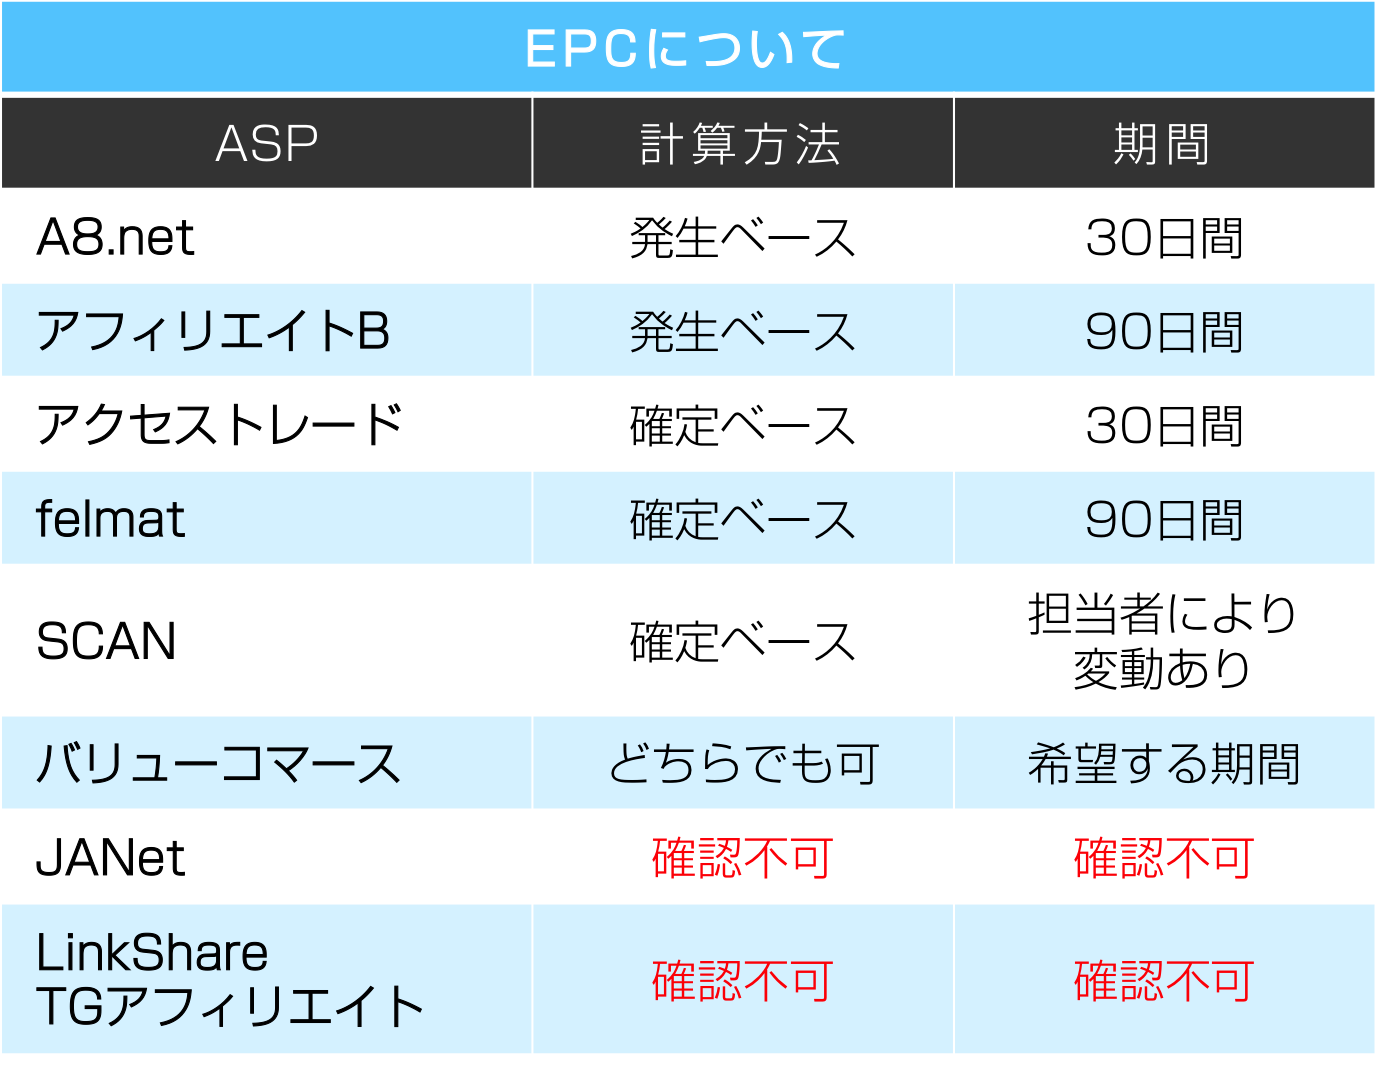 ASP別EPCの計算方法と期間